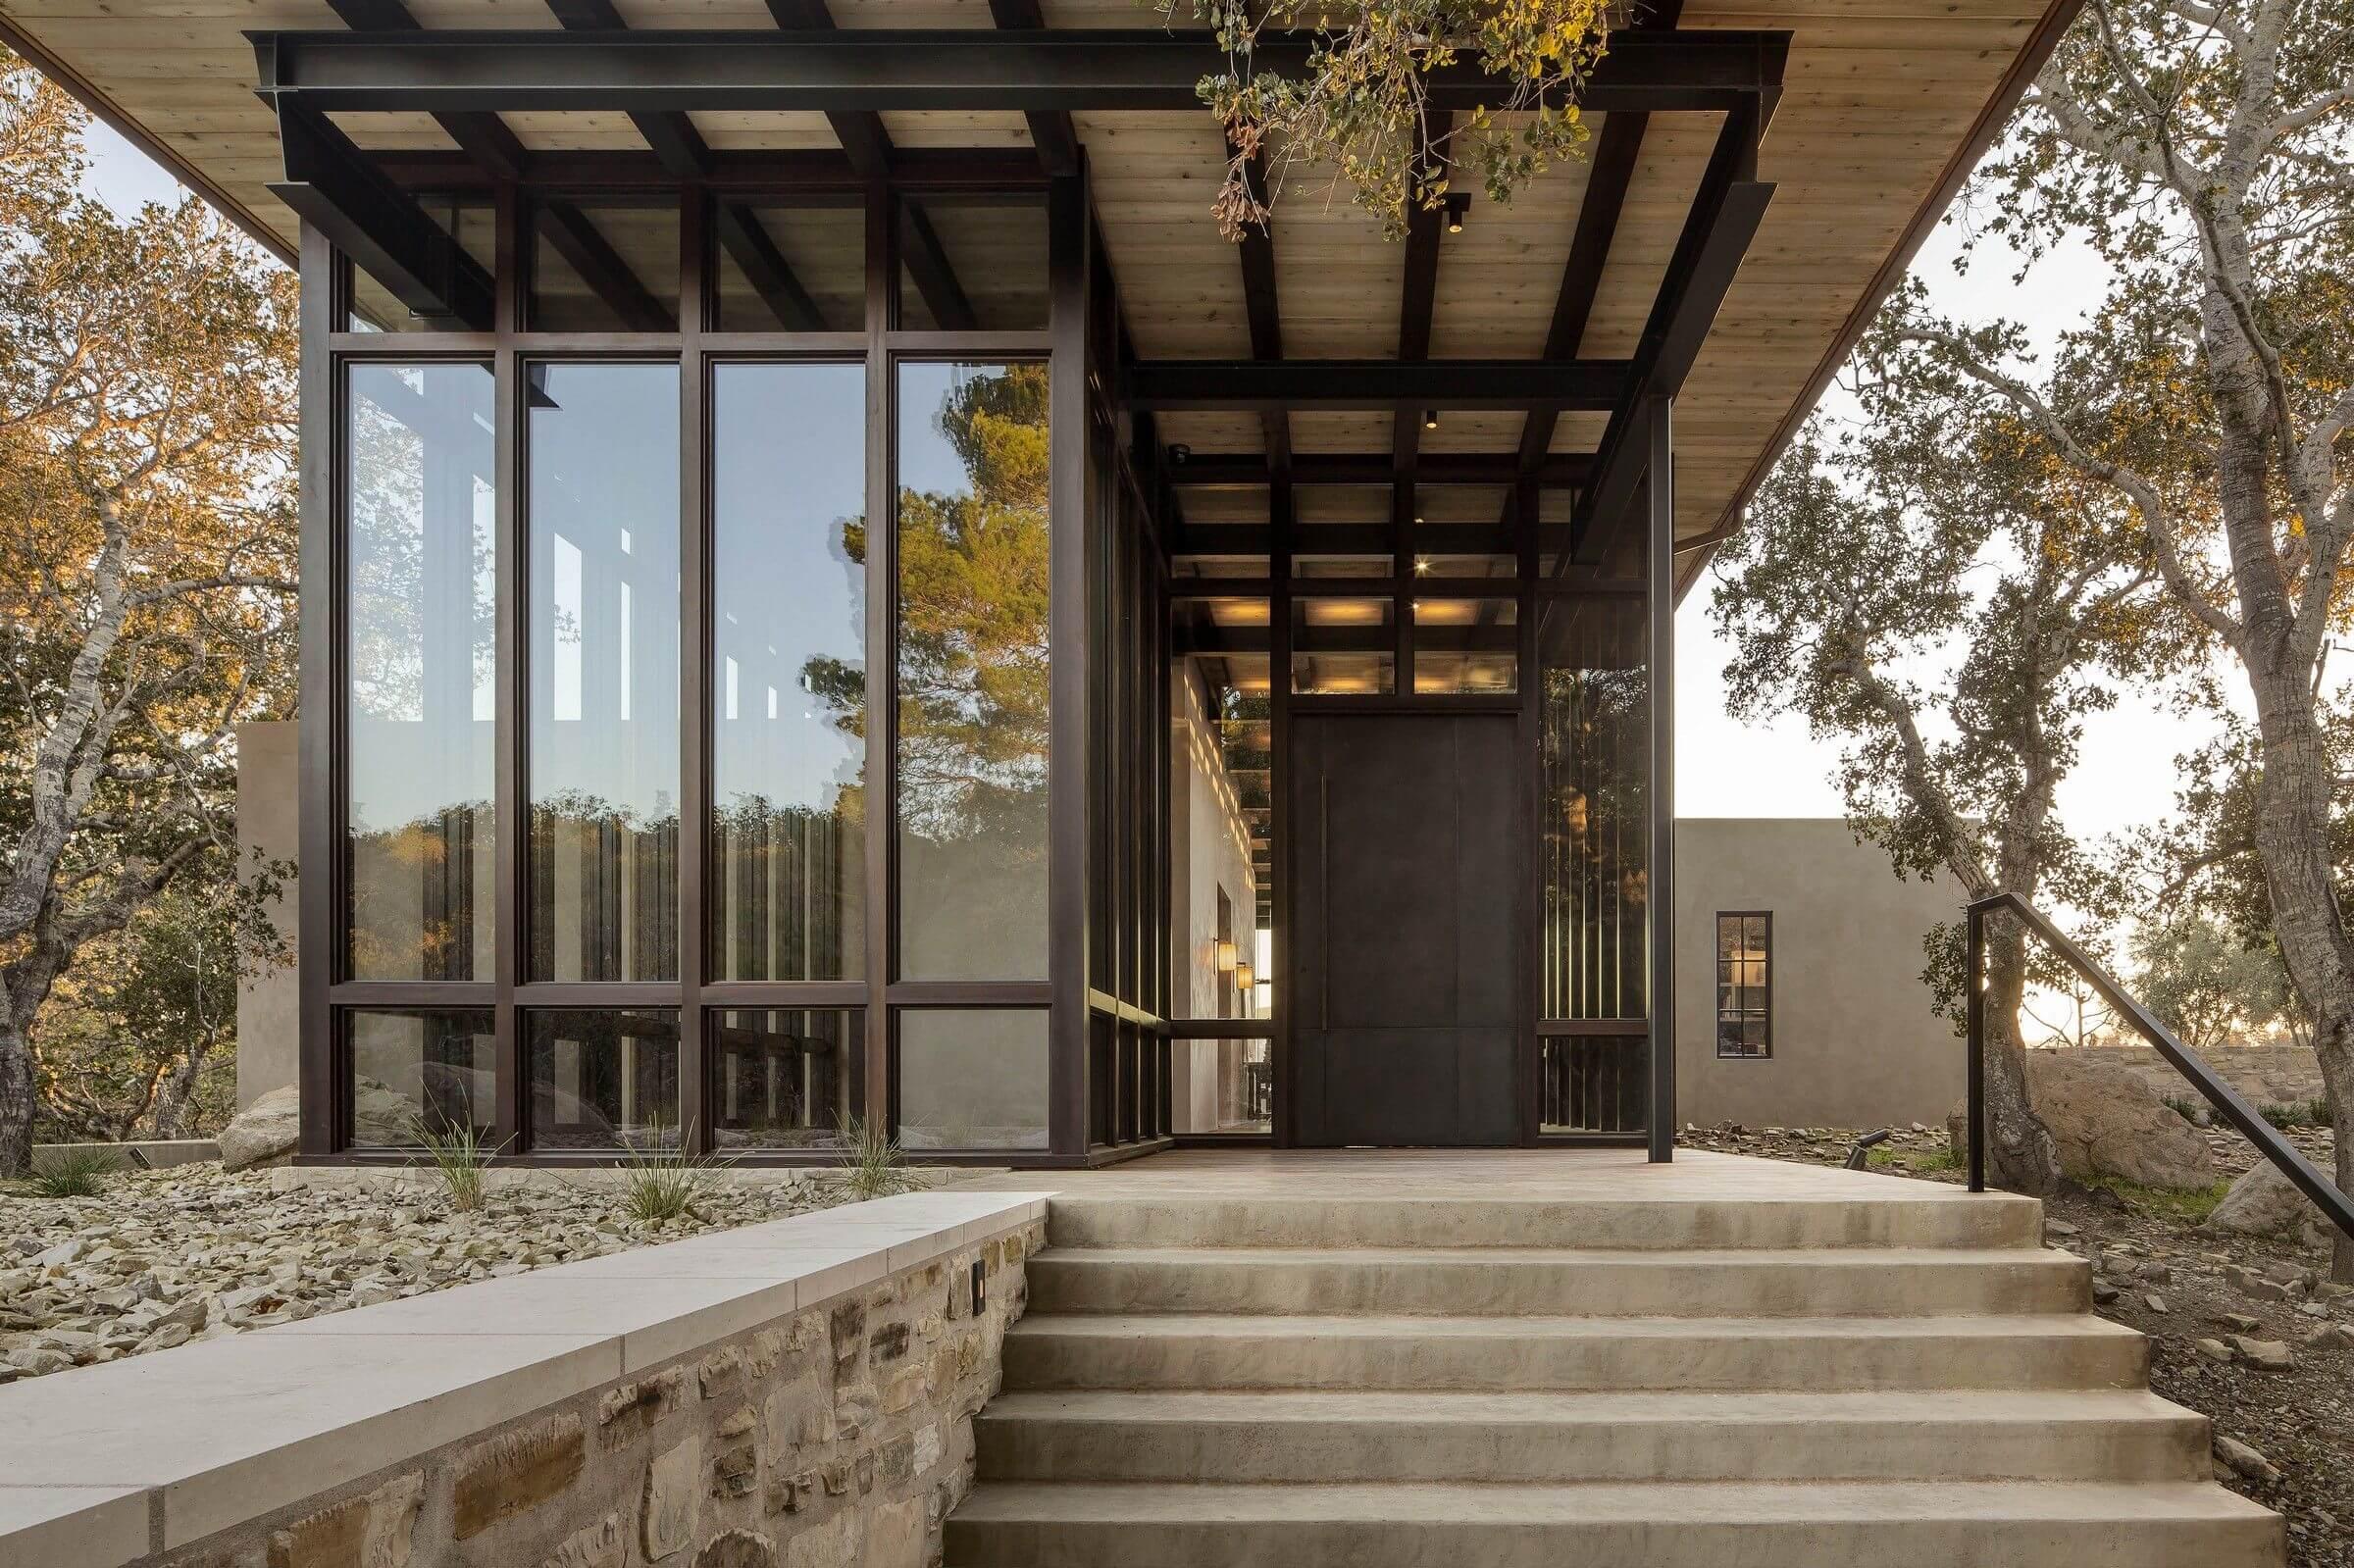 Tehama 1 House by Studio Schicketanz